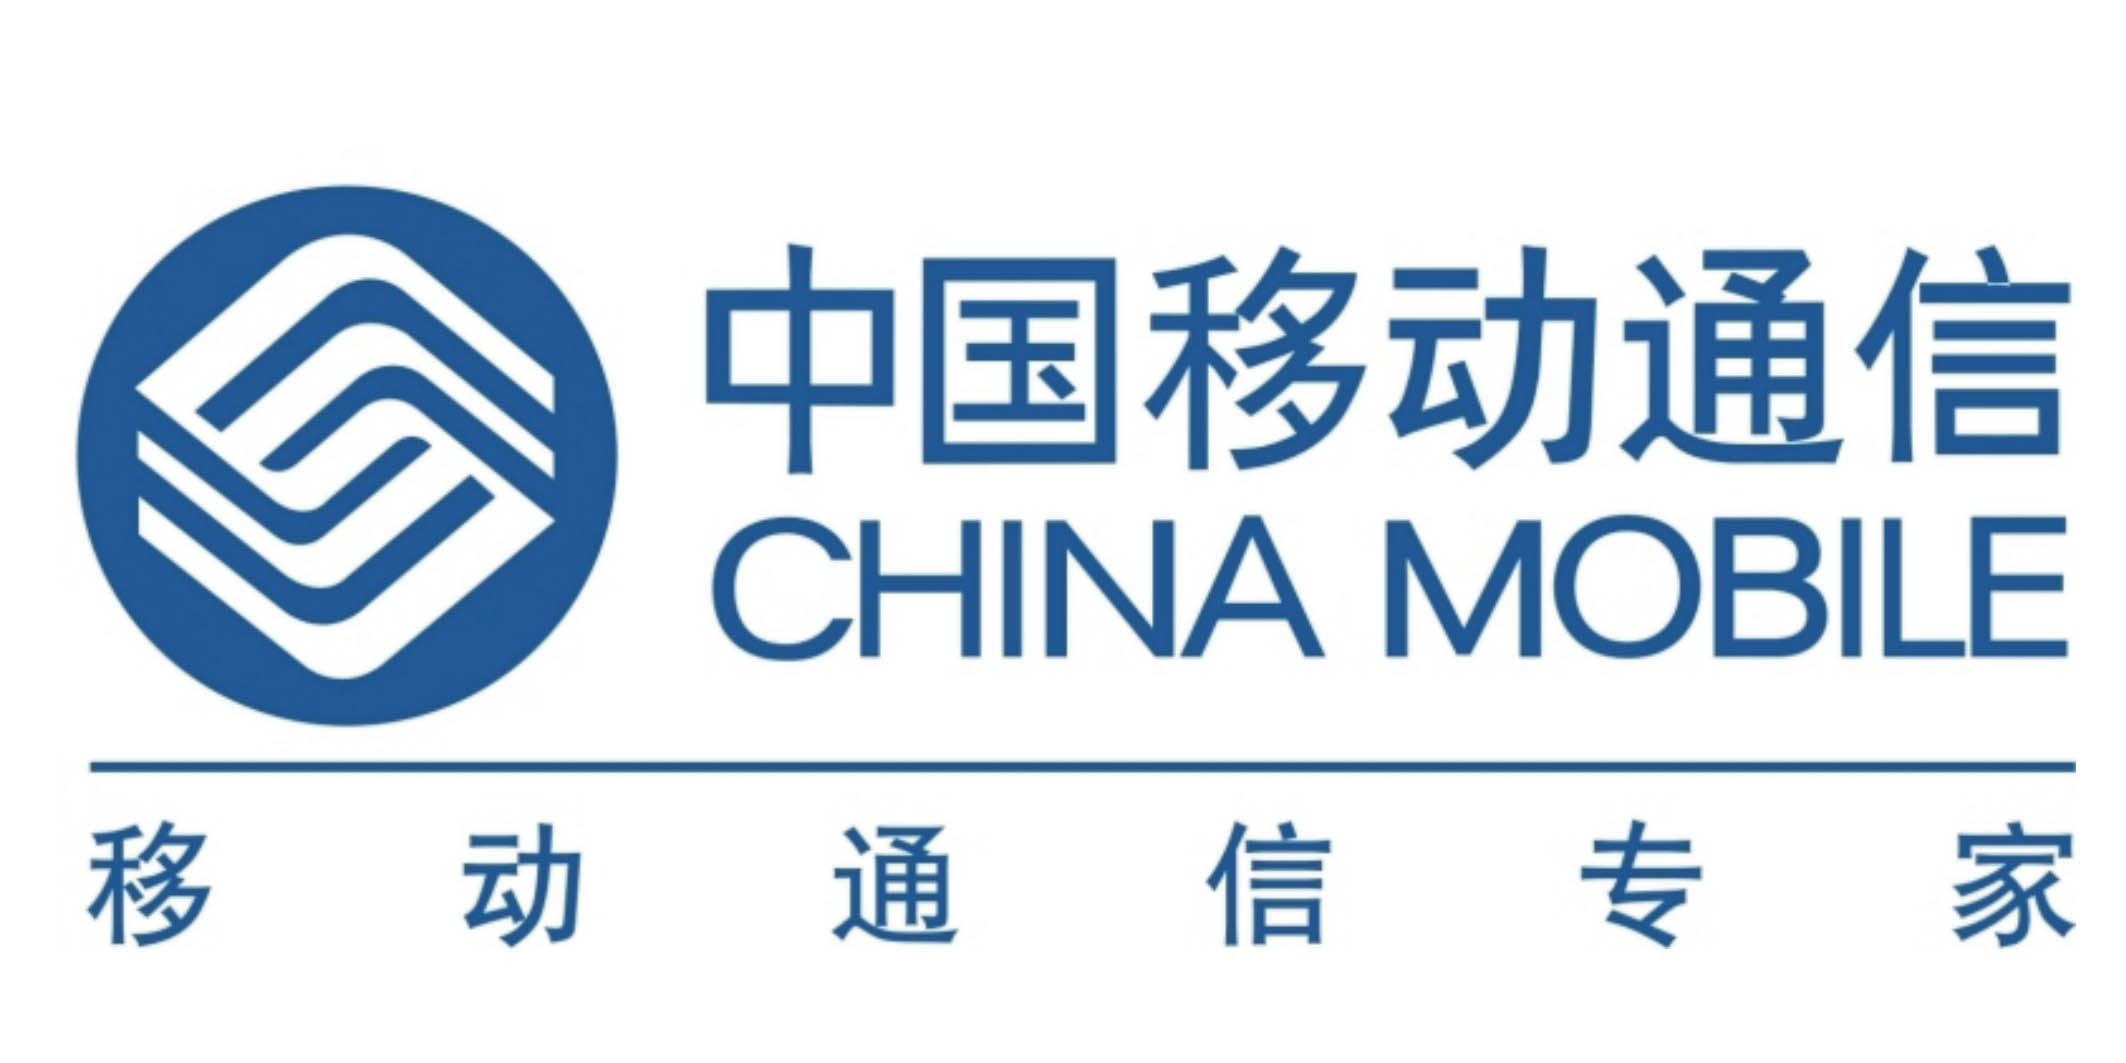 logo logo 标识 标志 设计 矢量 矢量图 素材 图标 2126_1063